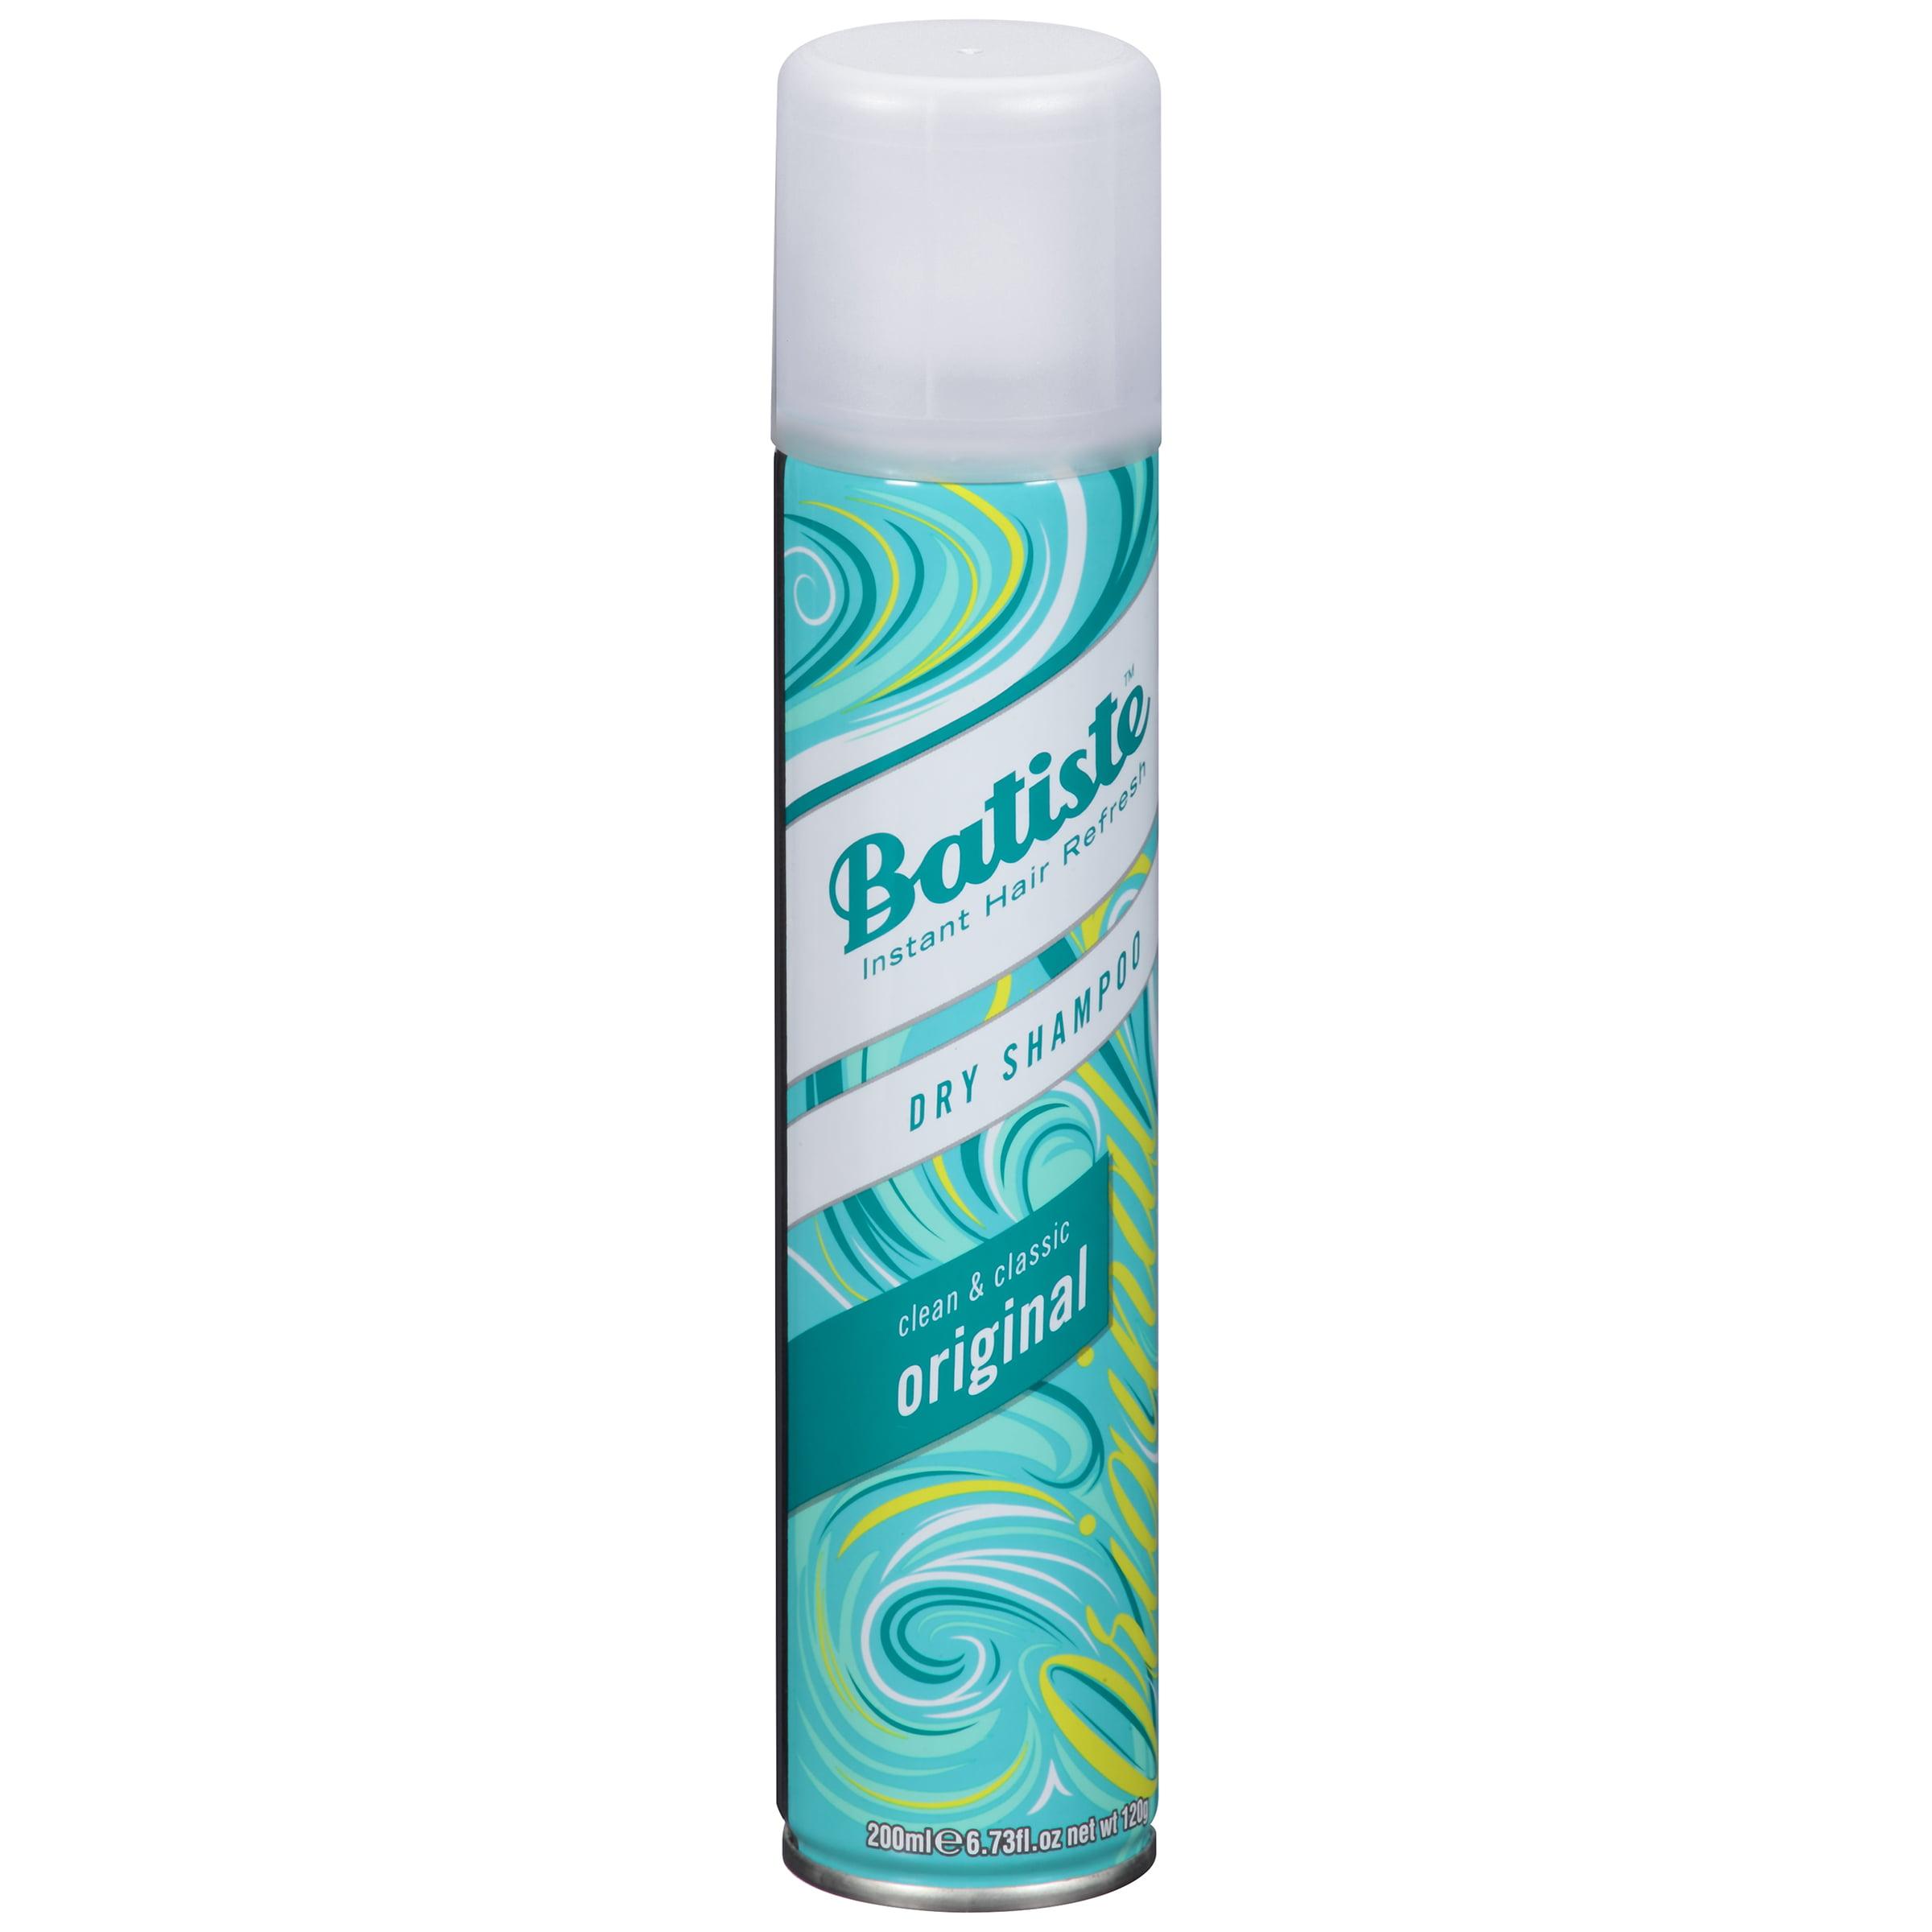 Batiste Dry Shampoo Original Clean & Classic Instant Hair